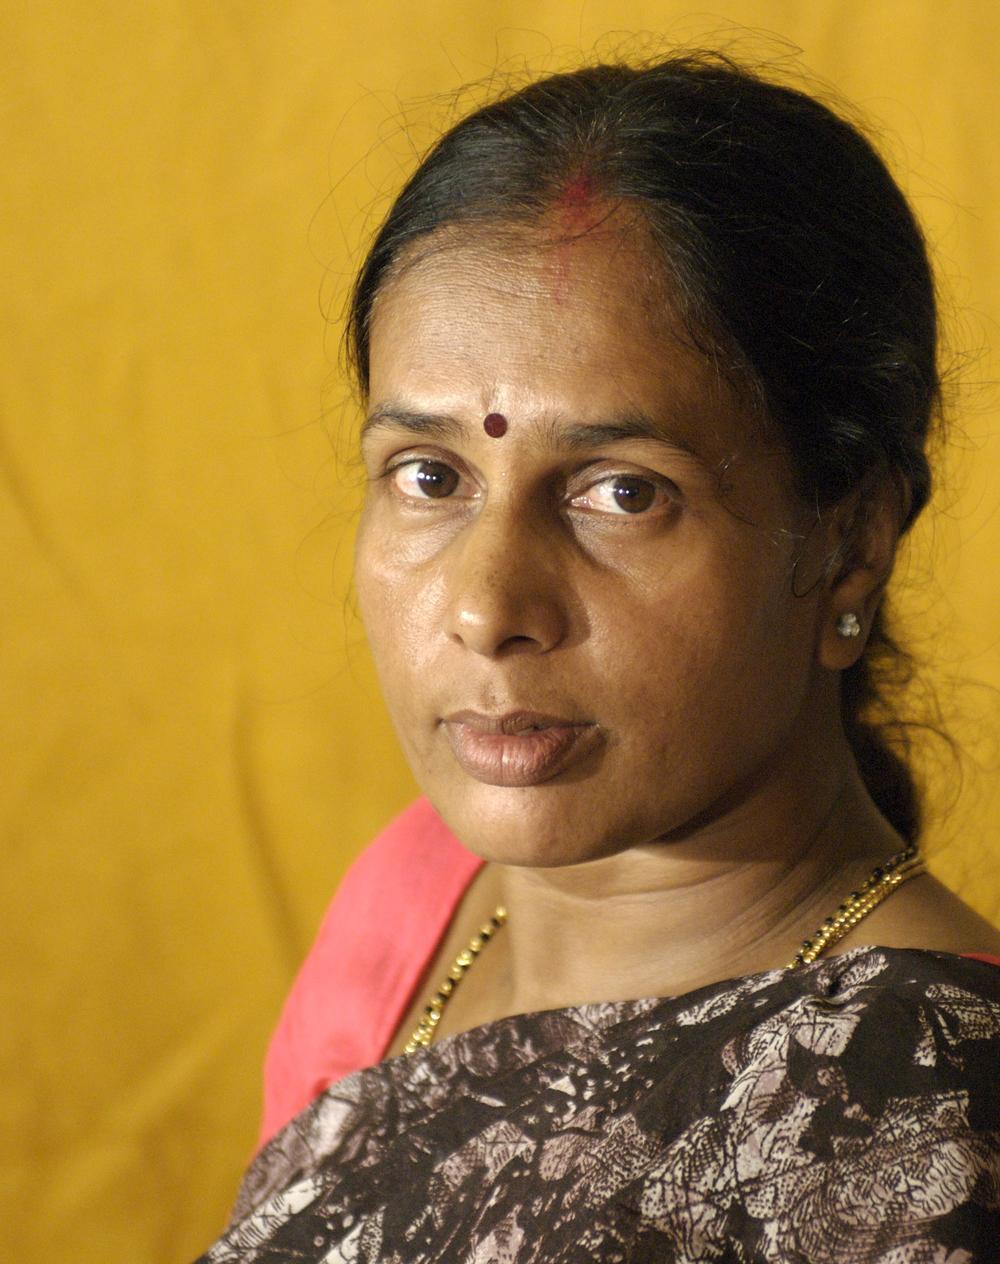 Sati Devi Tacchota (Costumes and Props)